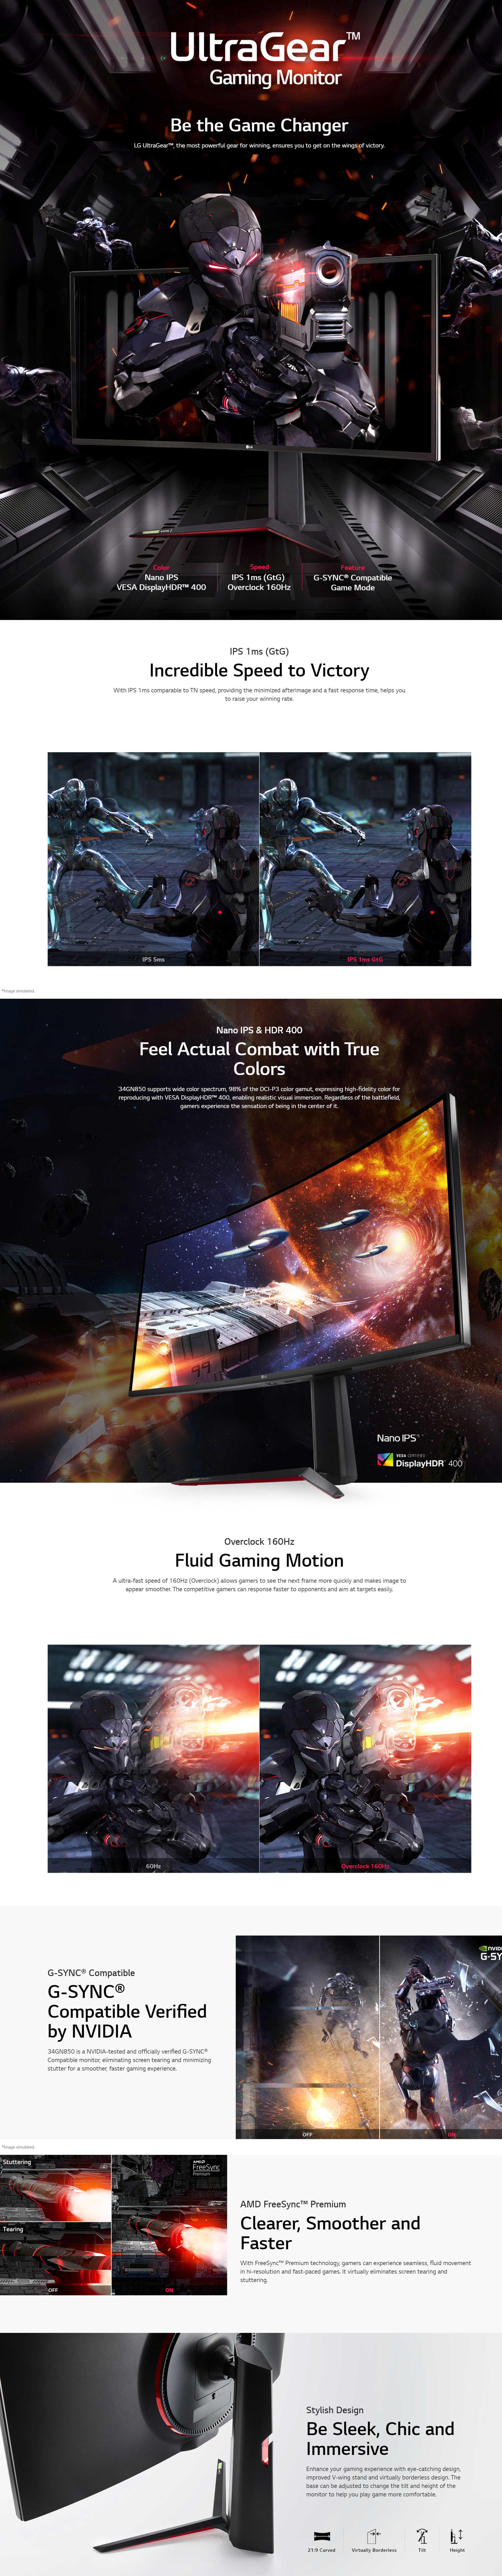 #1817---'LG-34GN850-B-I-34-Inch-21_9-UltraWide-Monitor-I-LG-HK'---www_lg_com.jpg